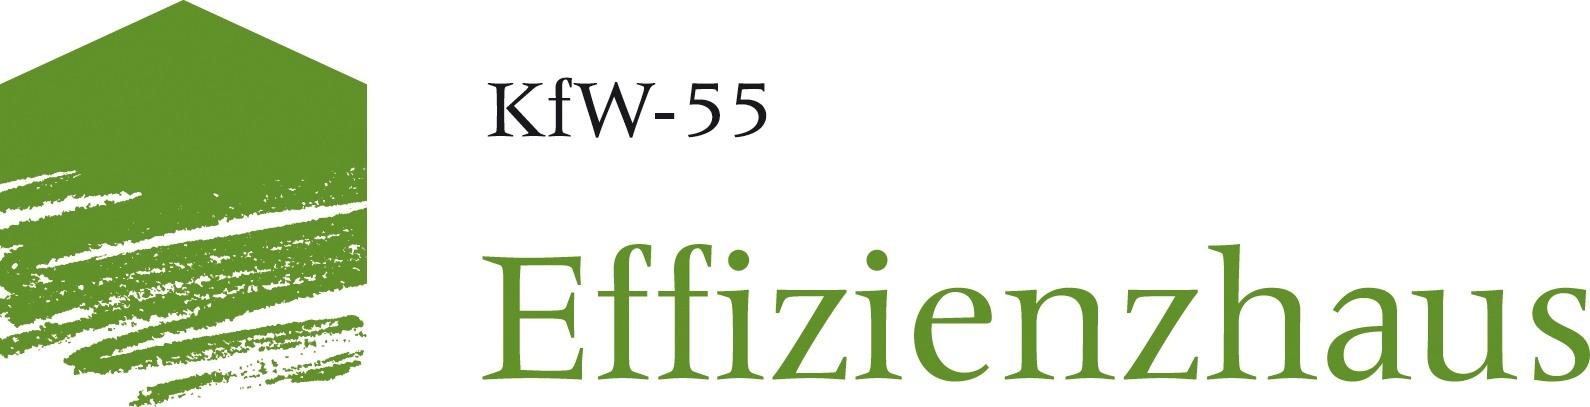 Effizienzhaus kfw55 rgb